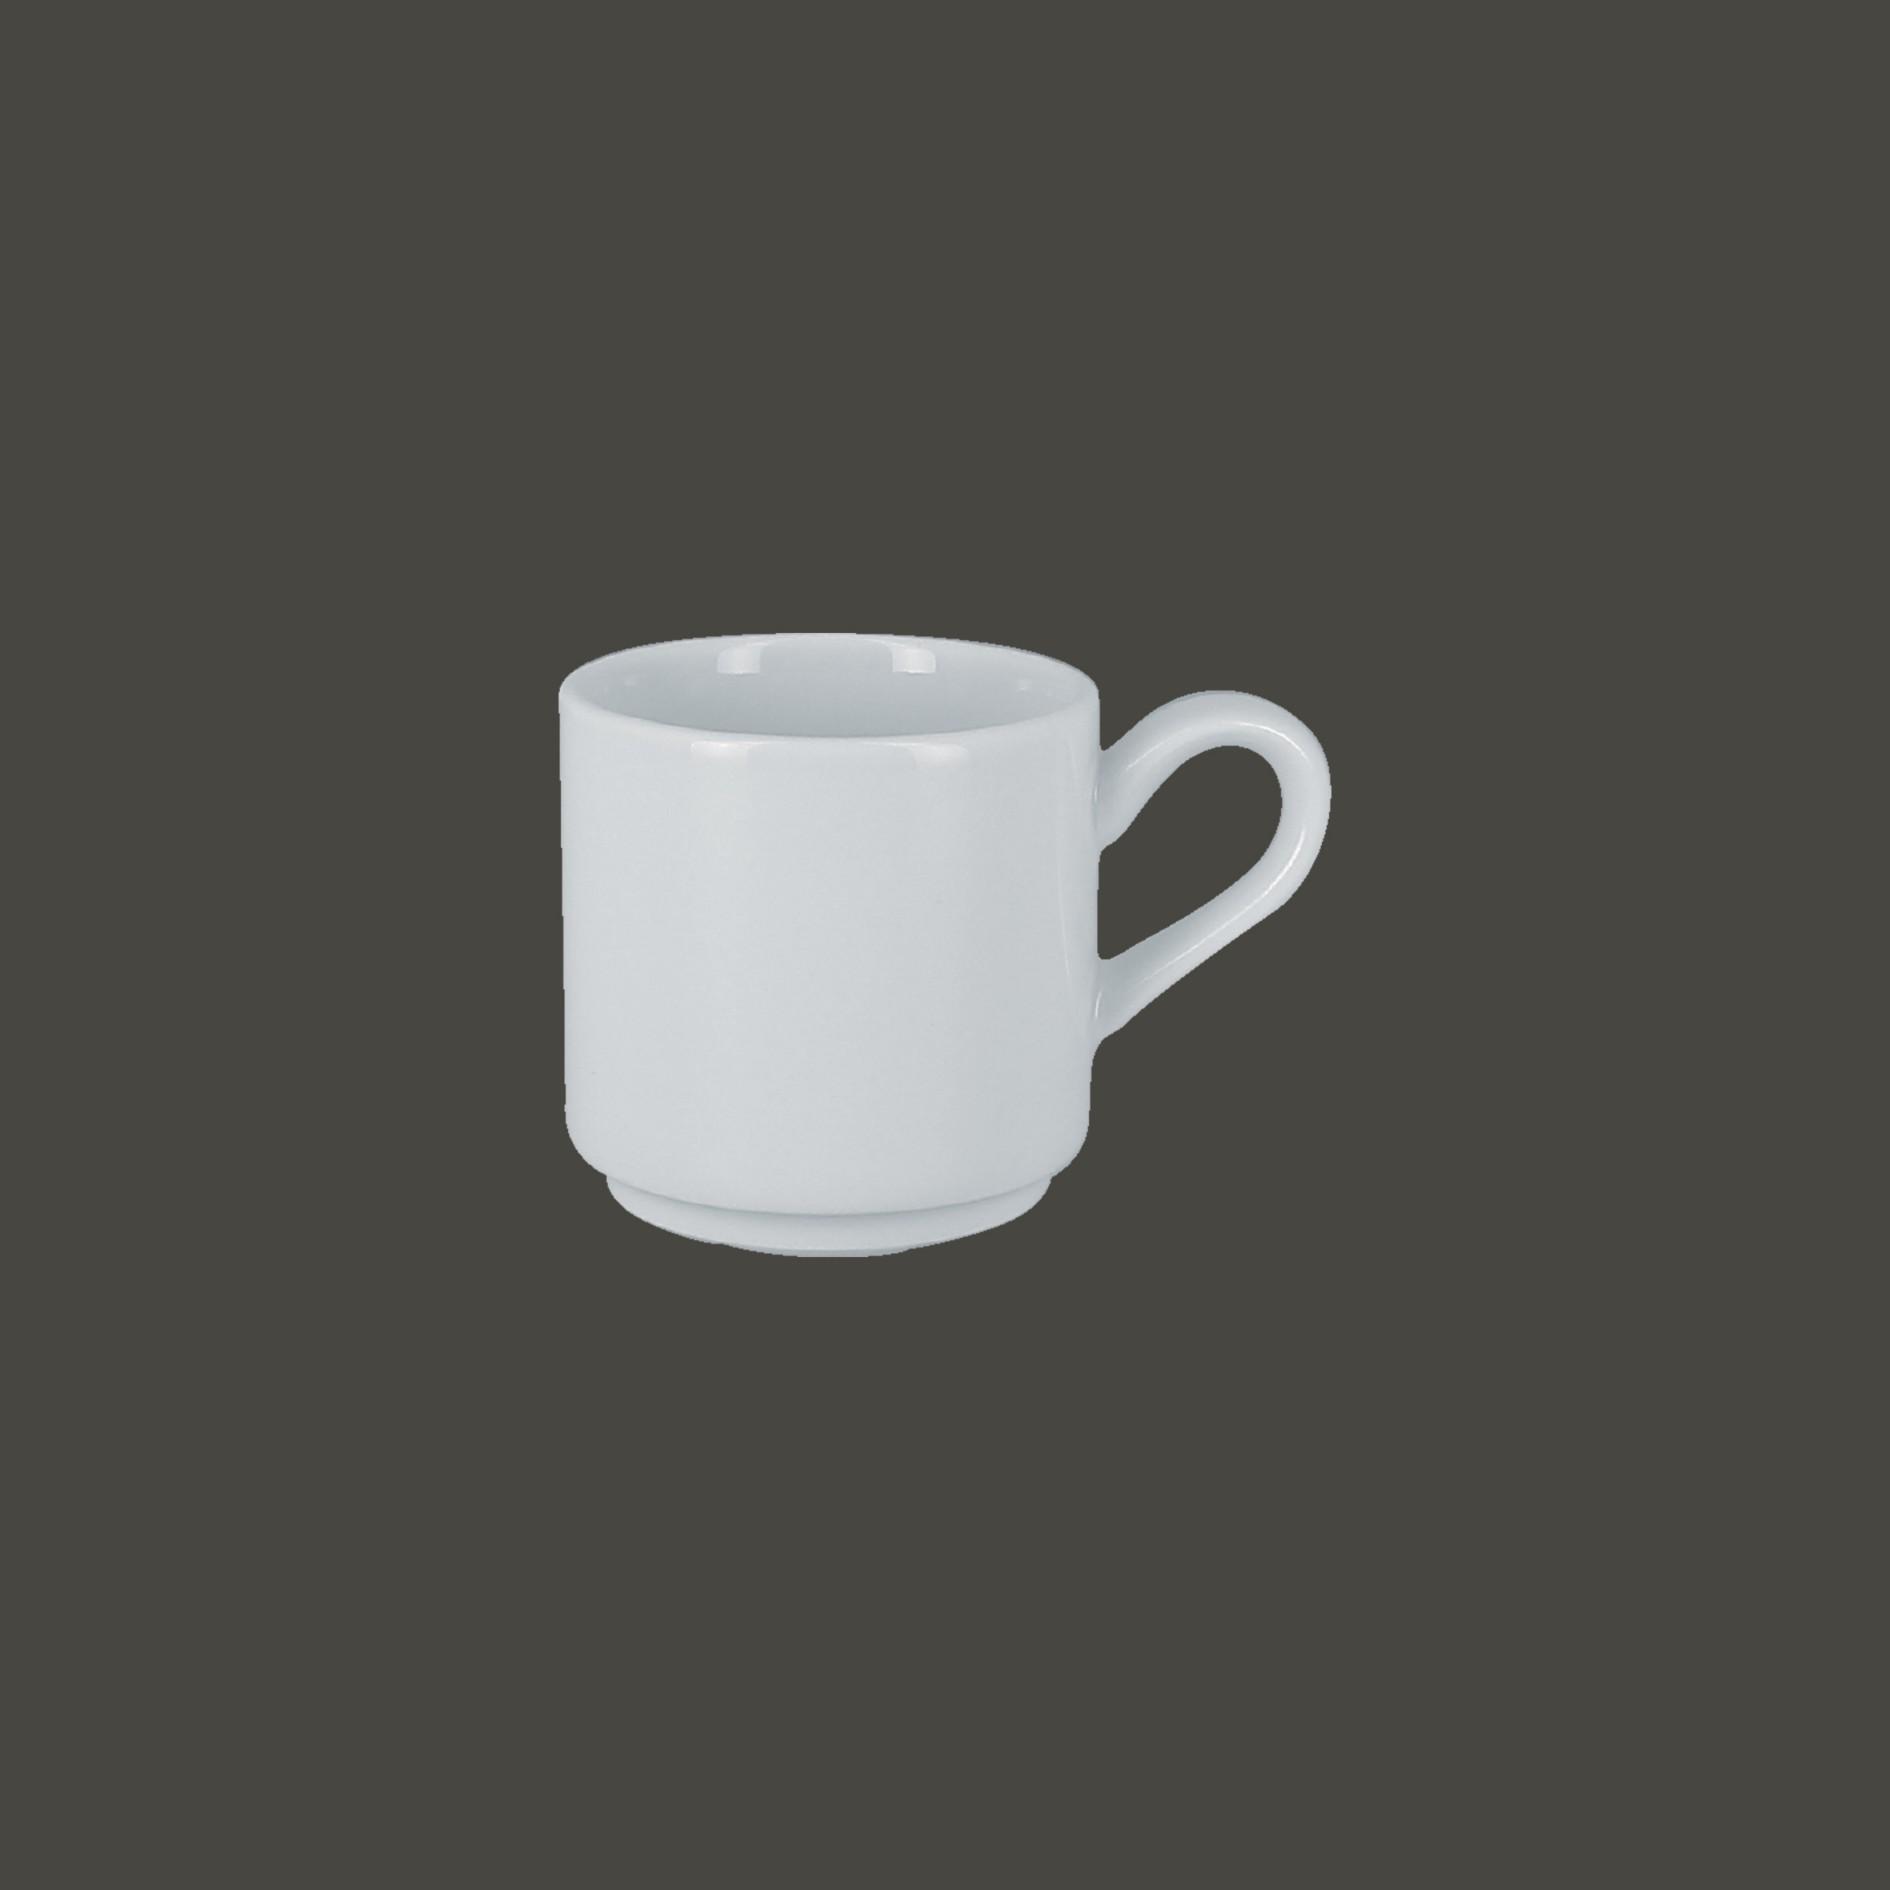 Šálek na espresso stohovatelný 9 cl